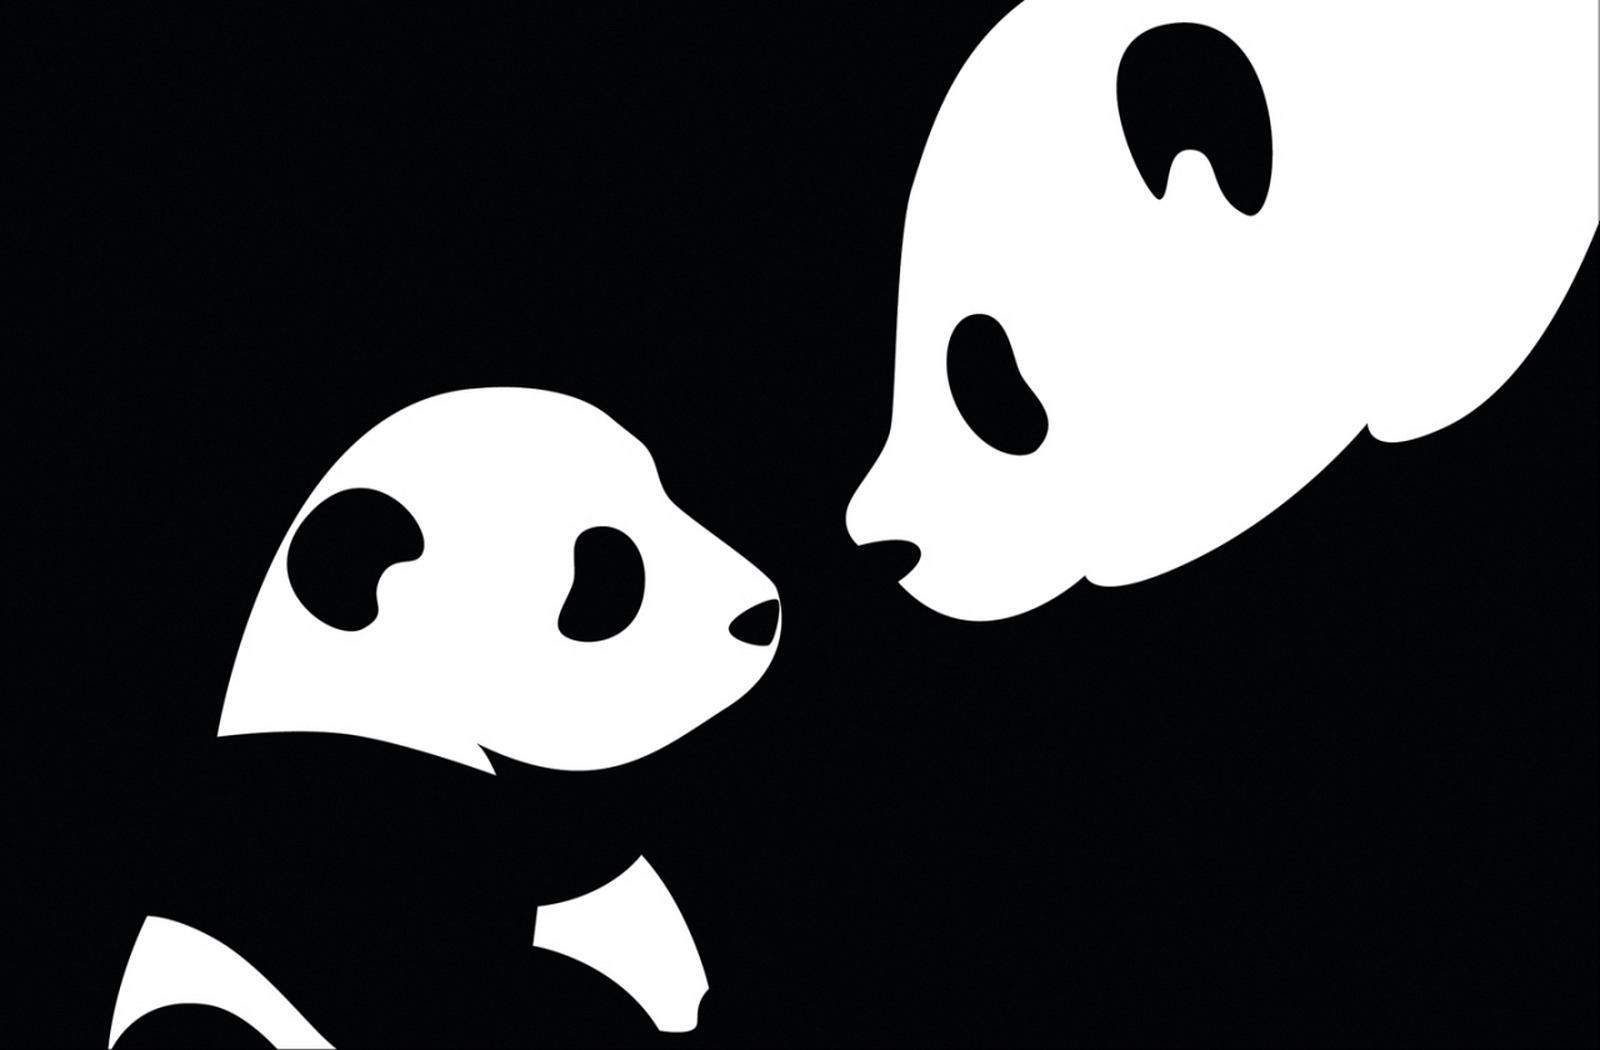 wallpaper drawing illustration silhouette panda emotion head